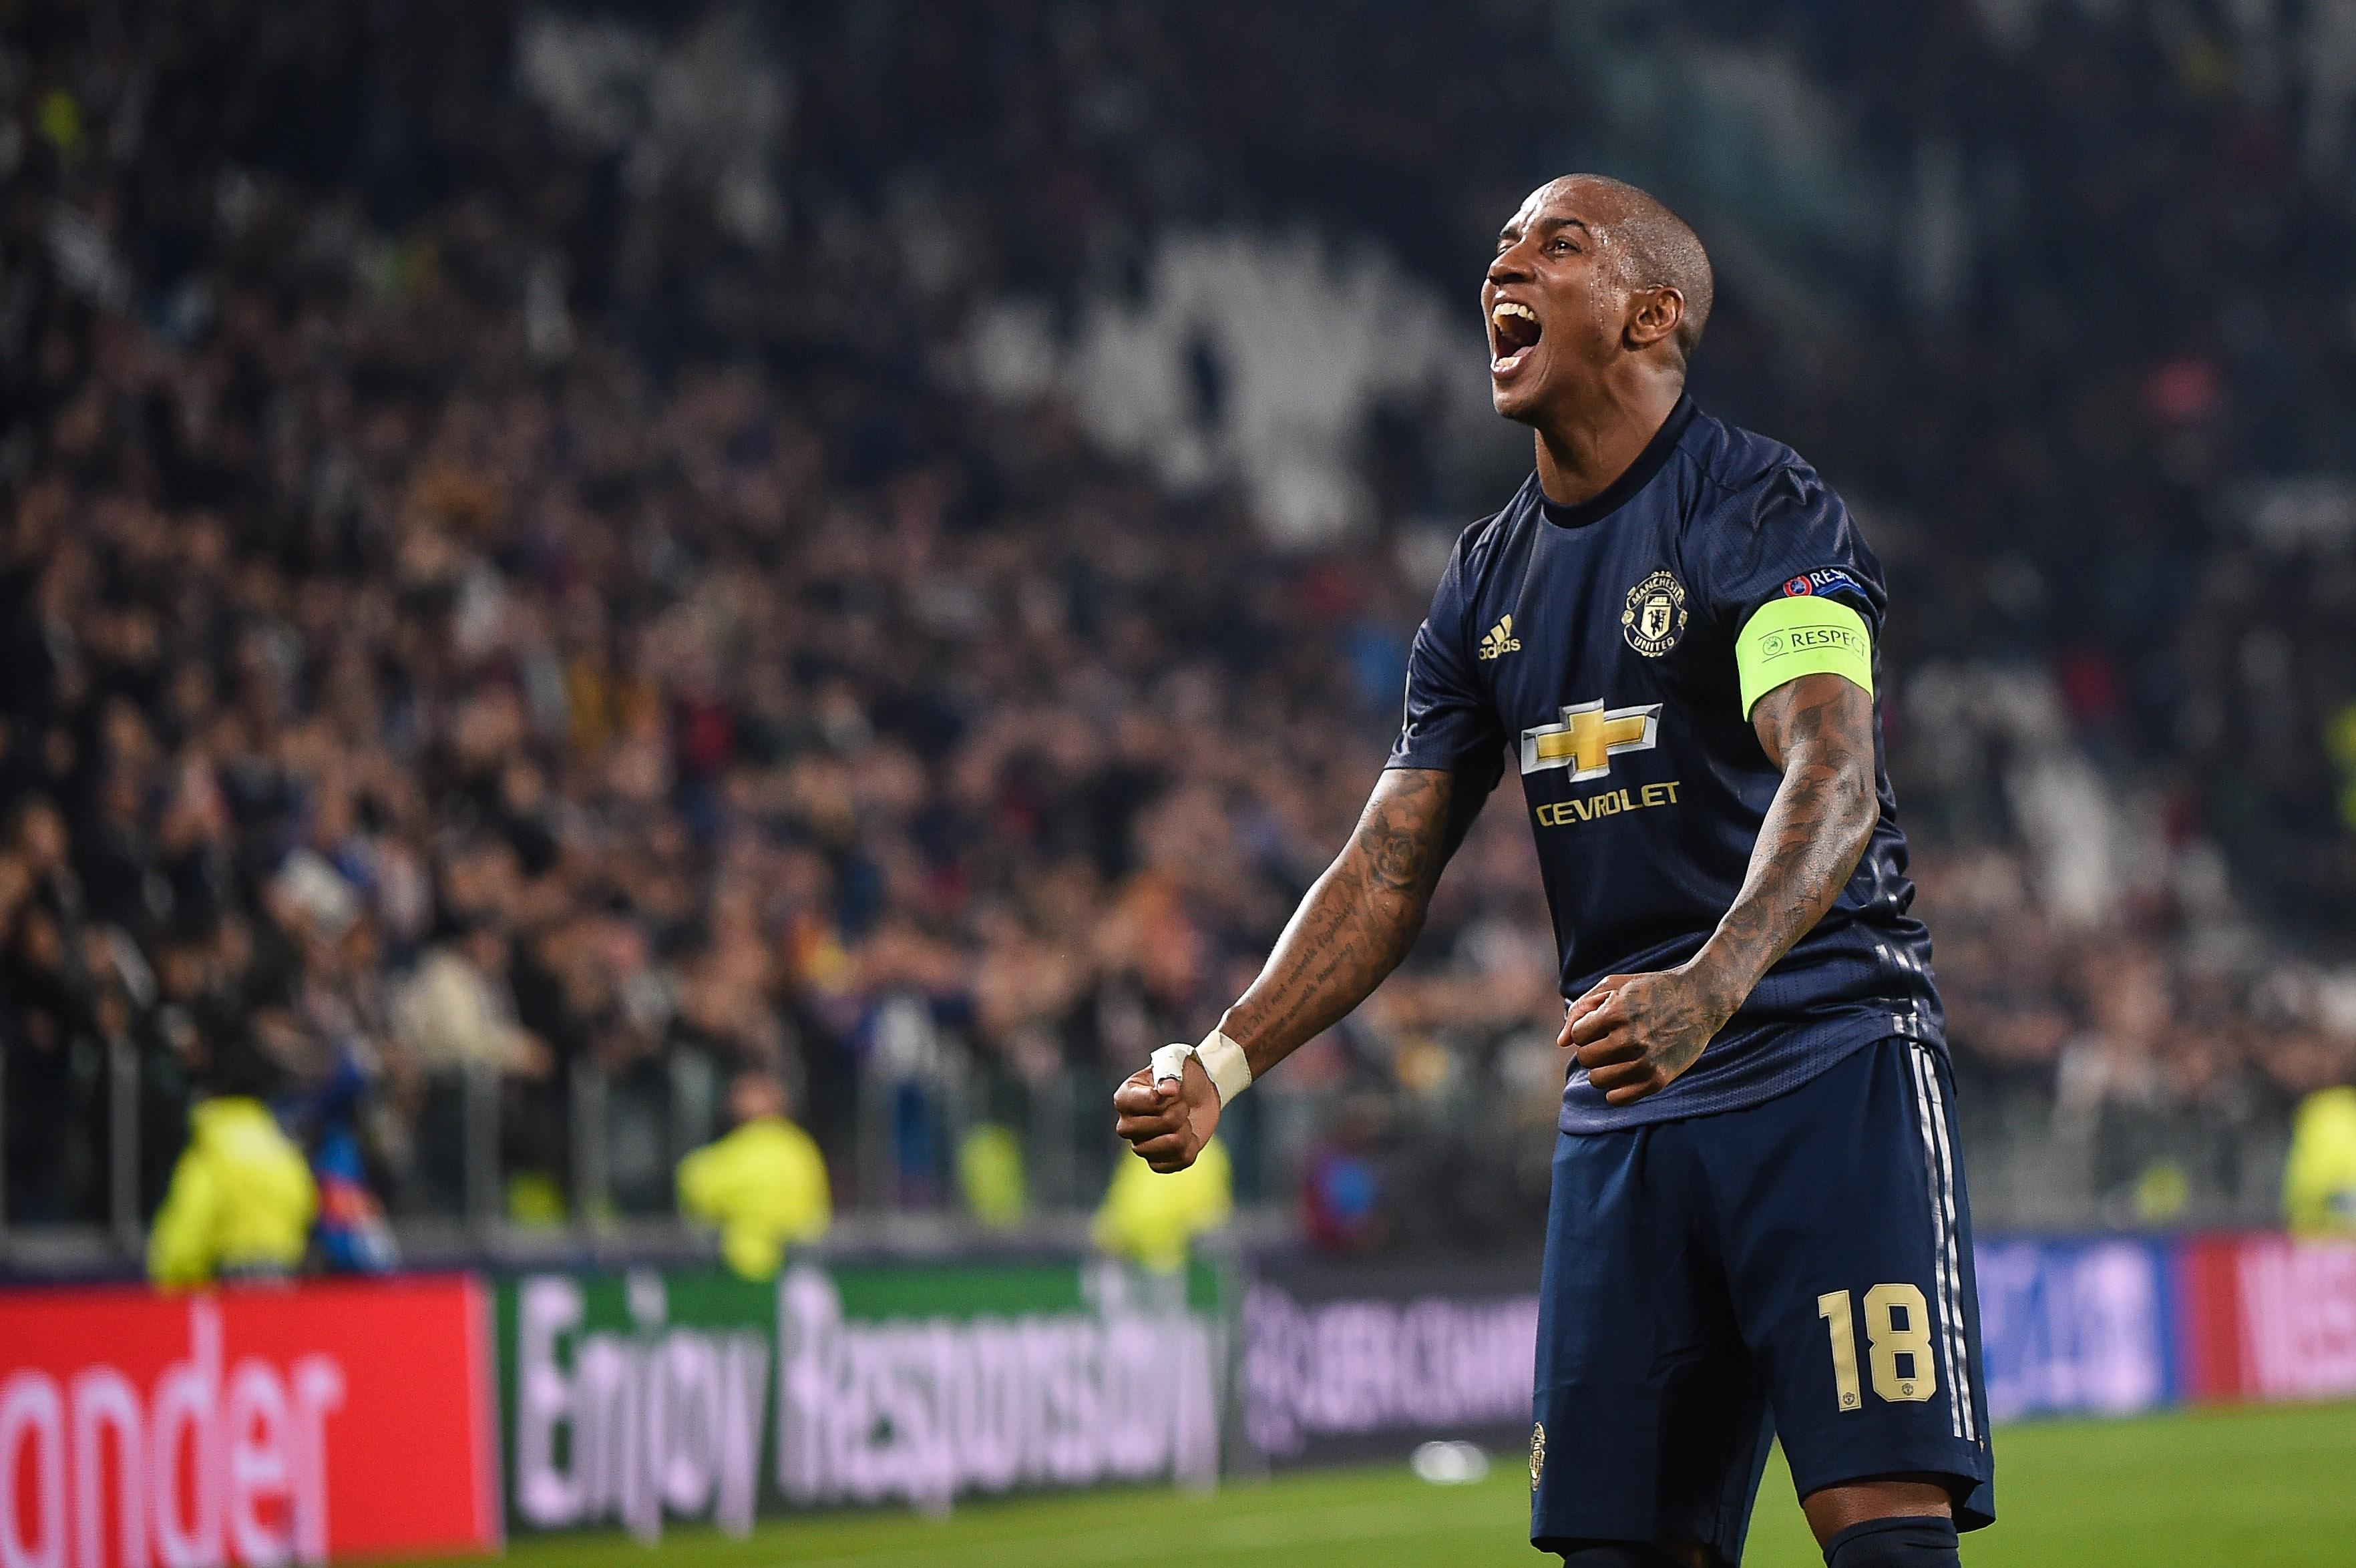 2018.11.07 Turyn, Liga Mistrzow 2018/2019, Juventus Turyn - Manchester United N/z: Ashley Young, Foto Lukasz Laskowski / PressFocus